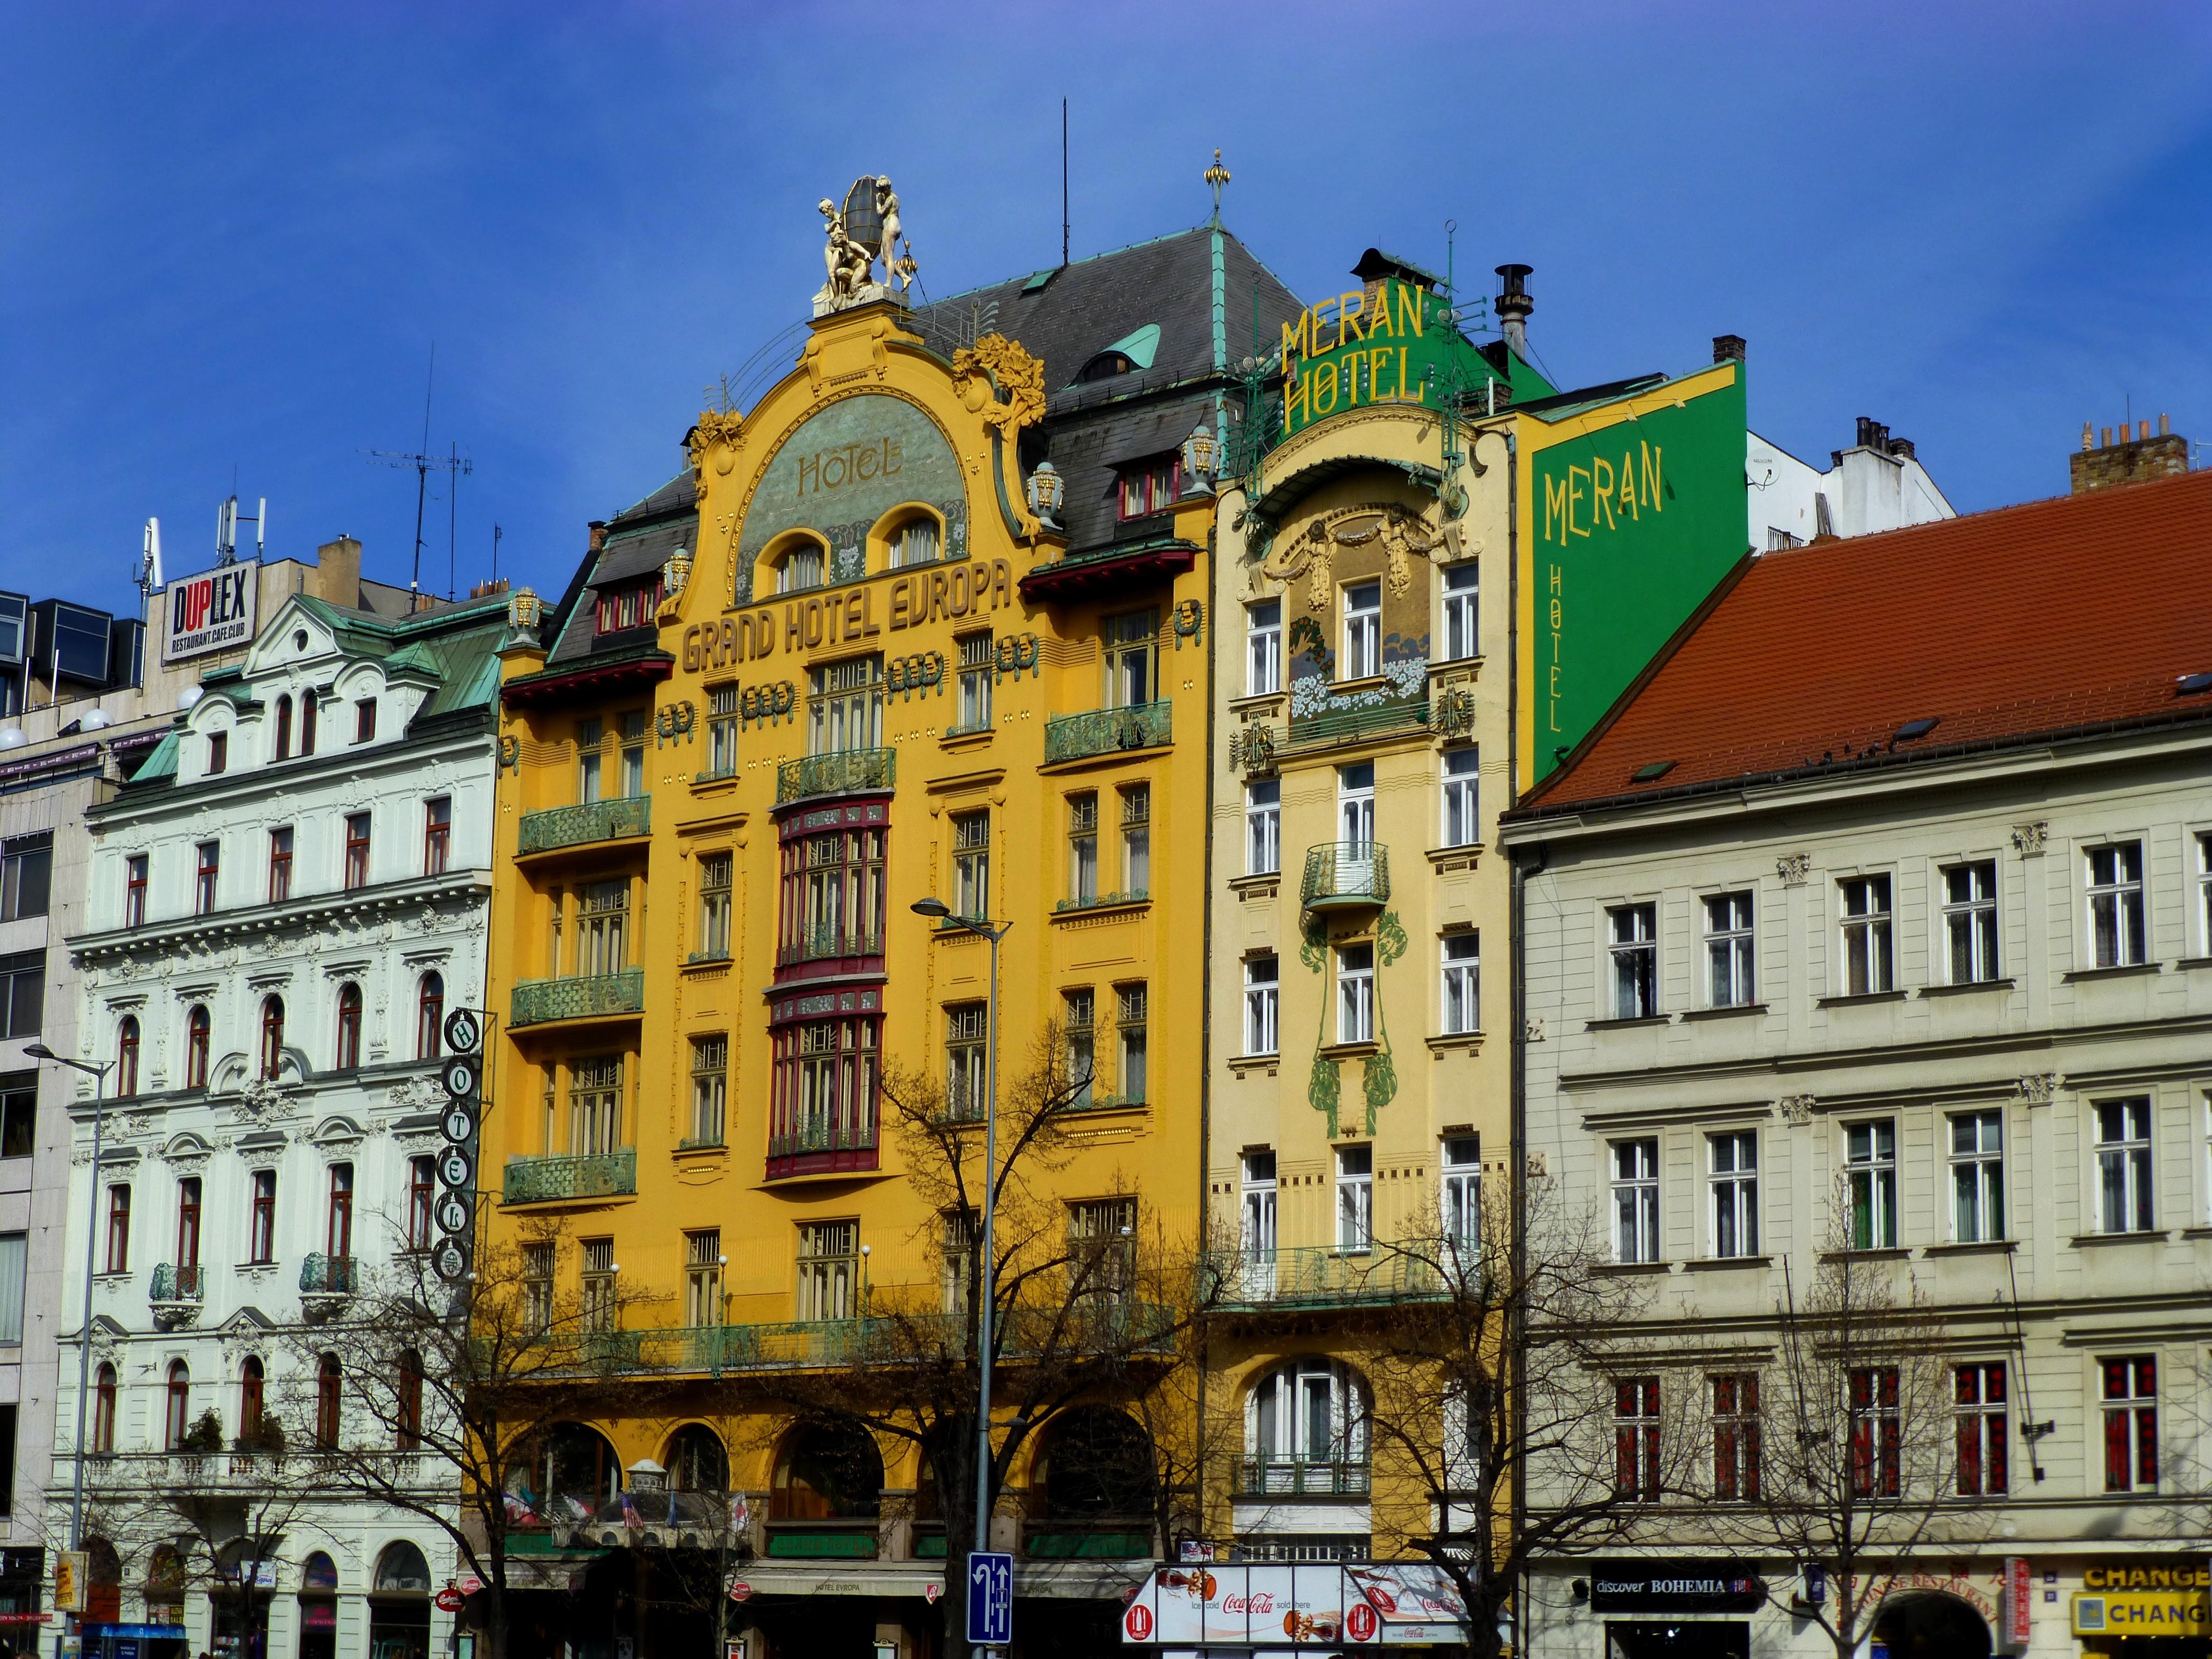 File Prag Grand Hotel Europa Und Meran Hotel Am Wenzelsplatz Vaclavskem Namesti Panoramio Jpg Wikipedia